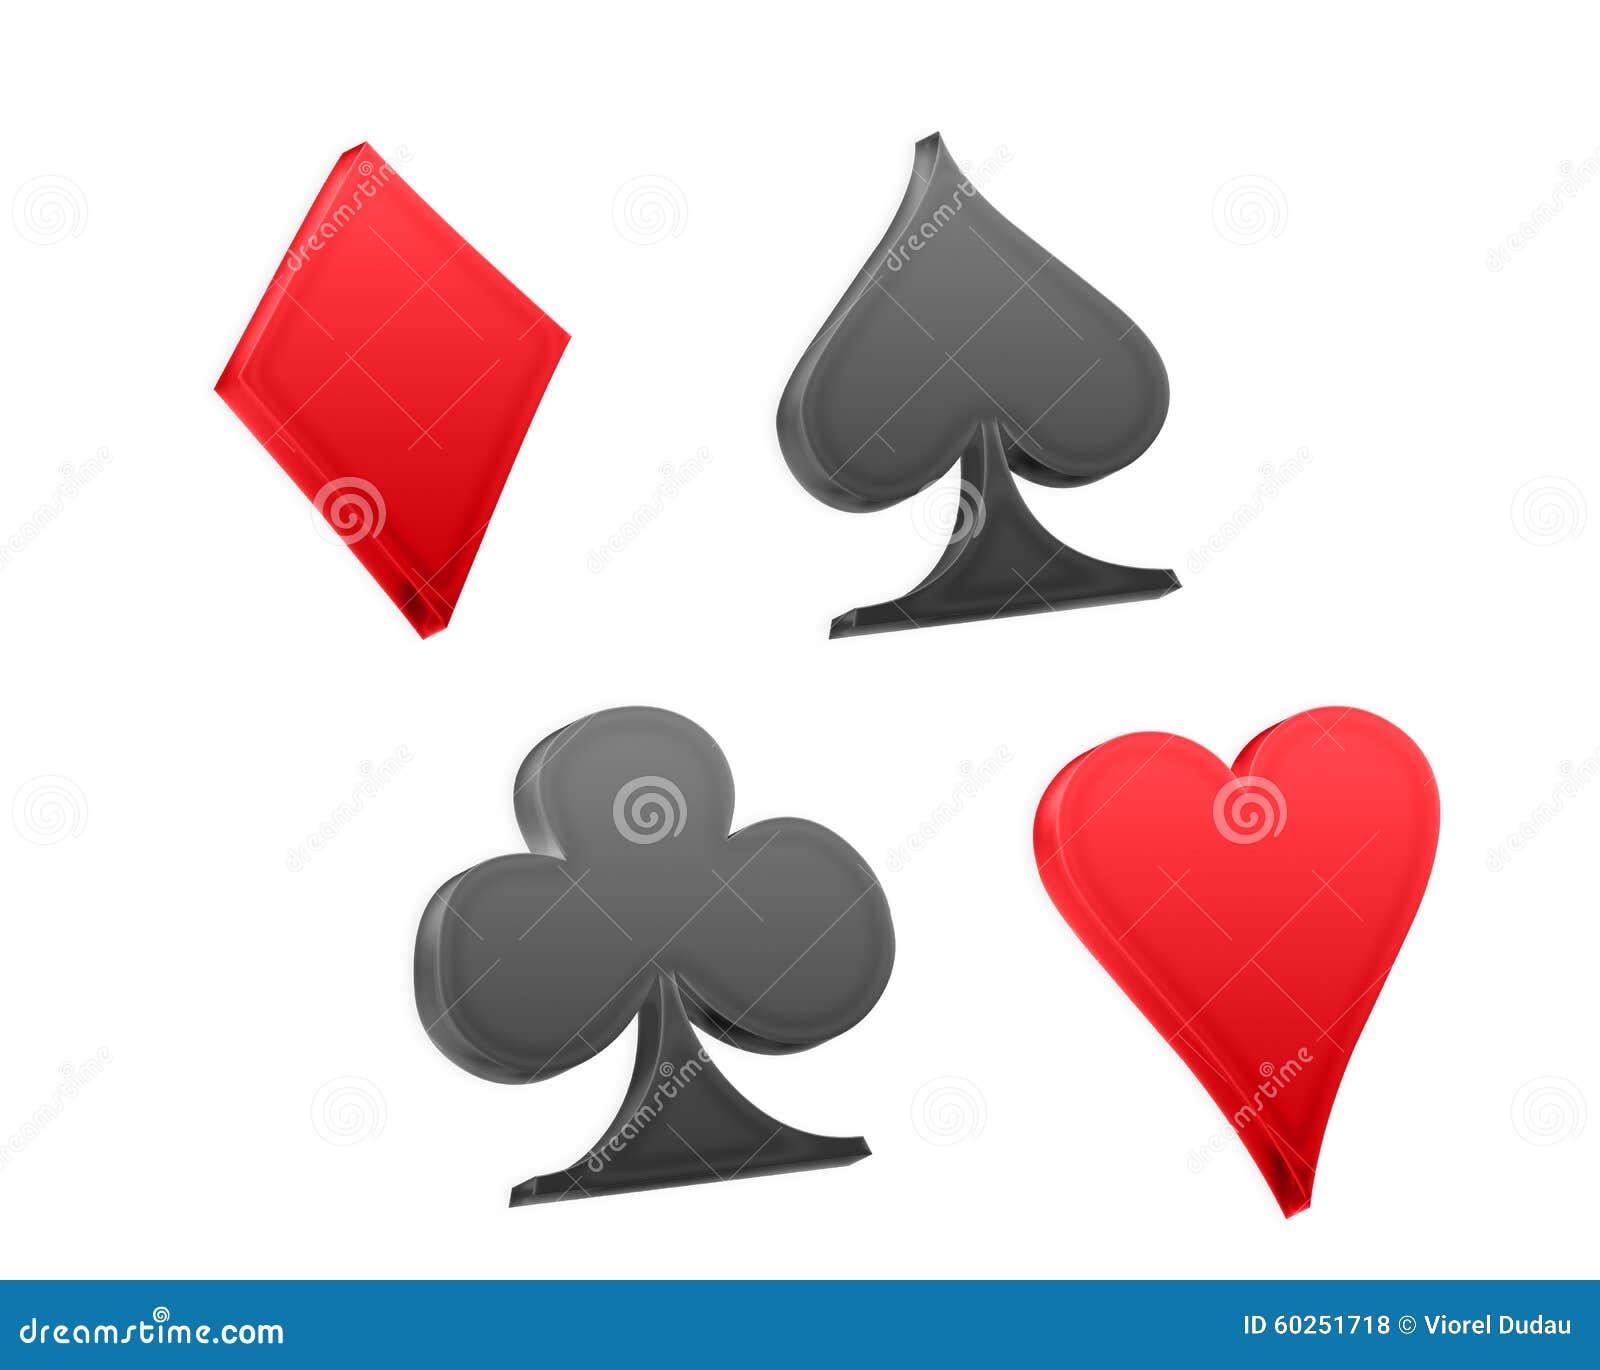 Poker playing cards symbols stock illustration illustration poker playing cards symbols biocorpaavc